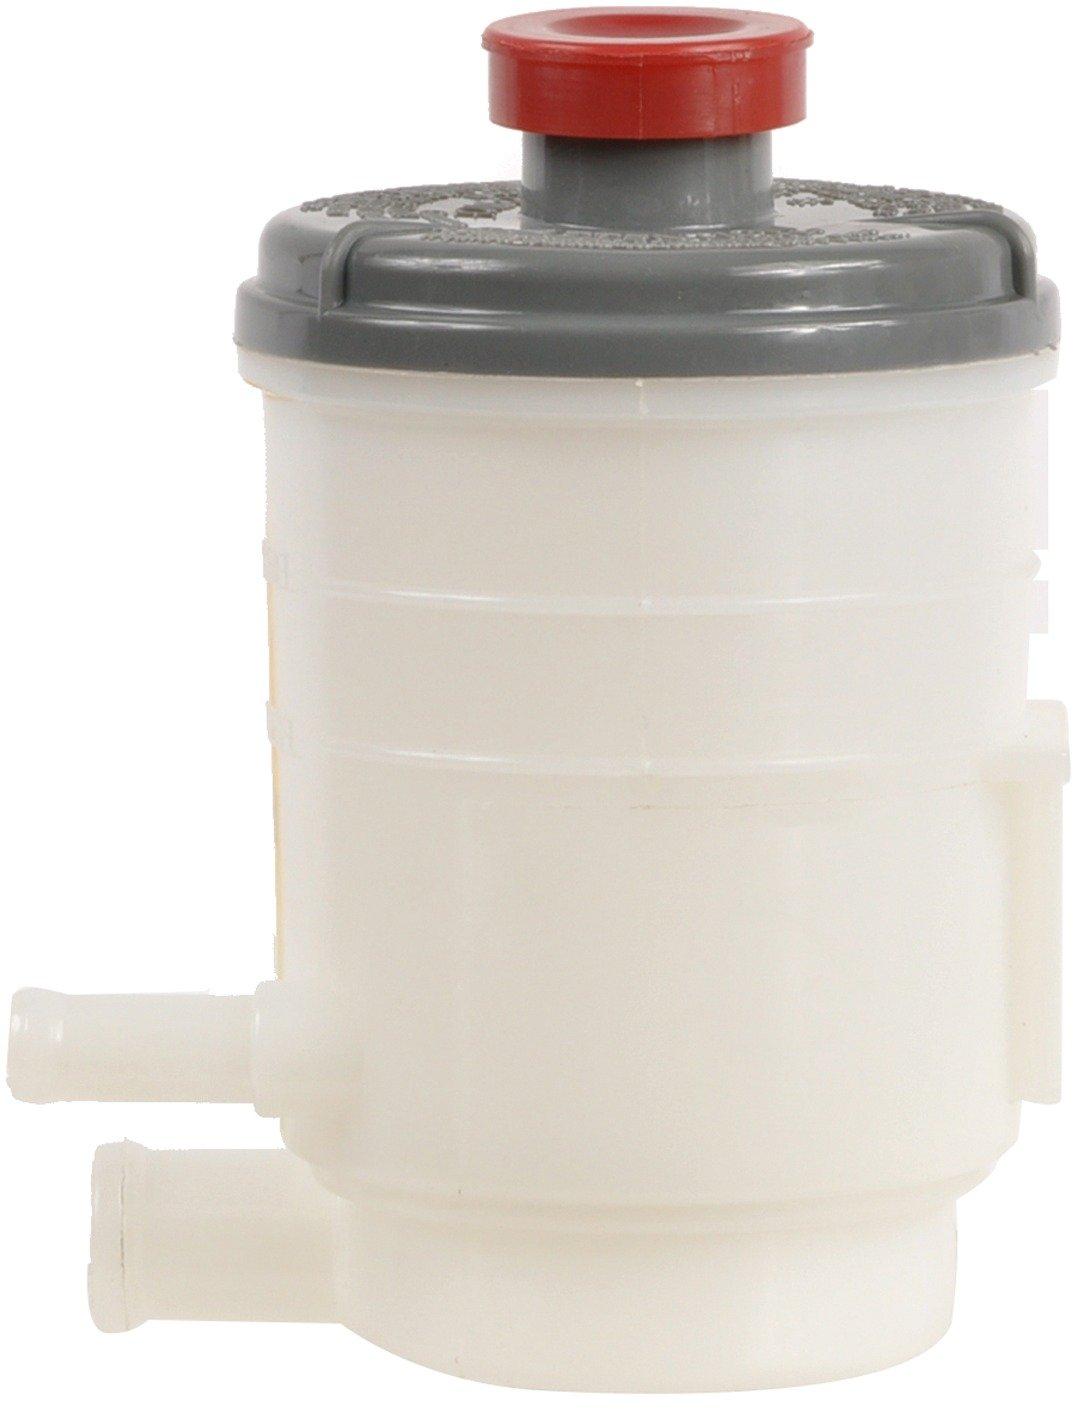 Dorman 603-938 Power Steering Reservoir